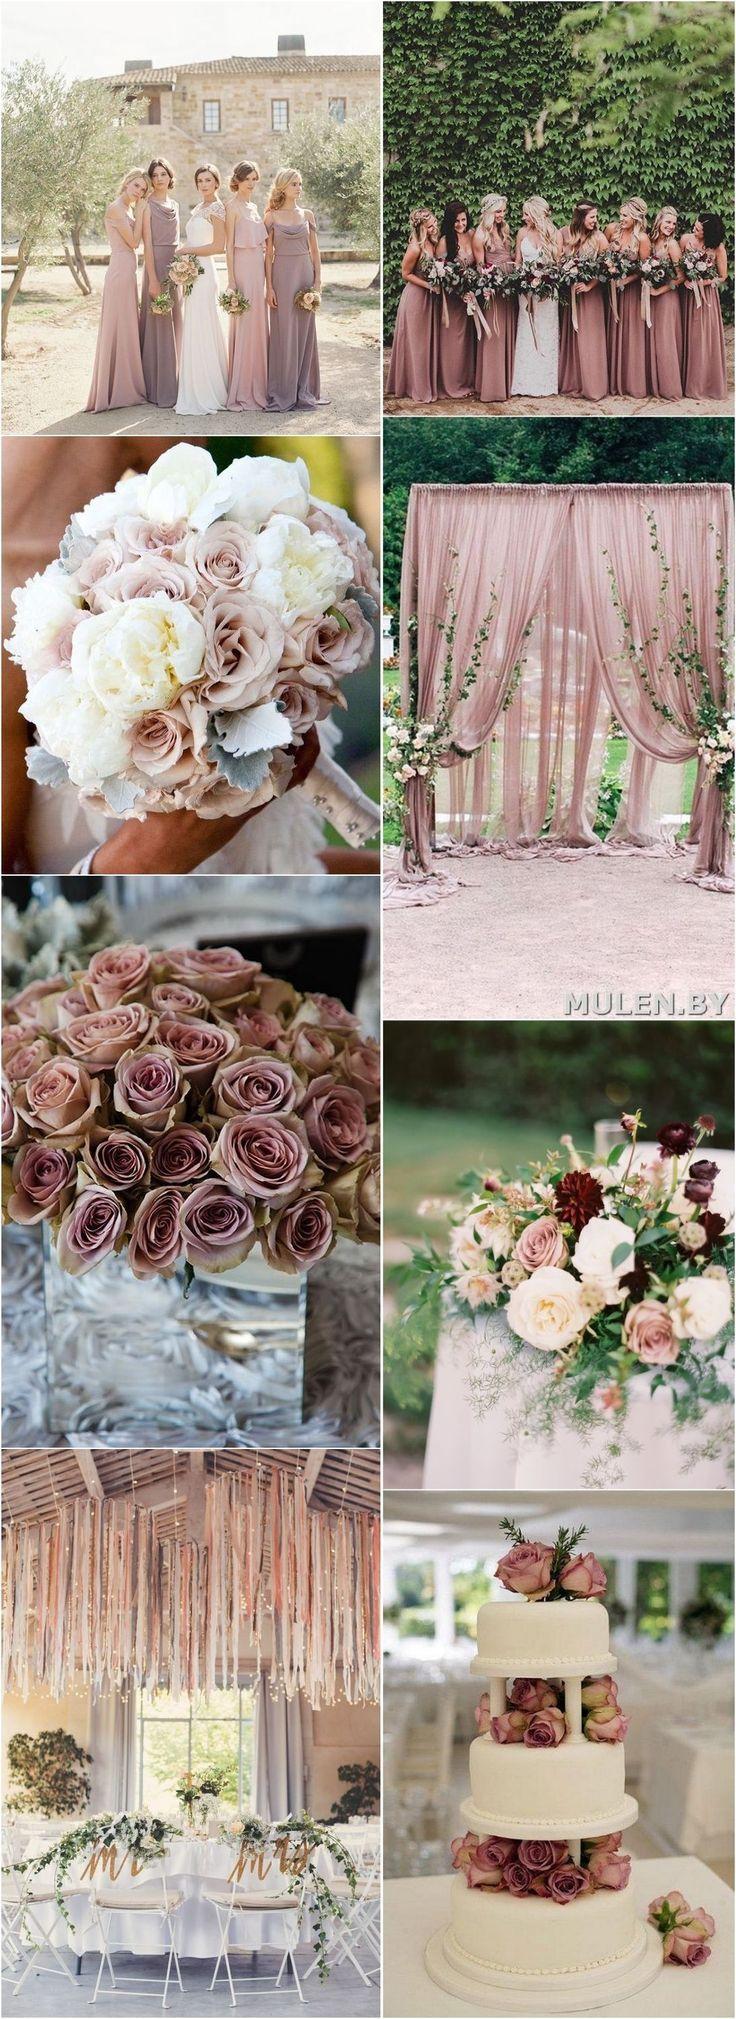 Dusty rose fall wedding color  ideas / http://www.deerpearlflowers.com/28-dusty-rose-wedding-color-ideas/